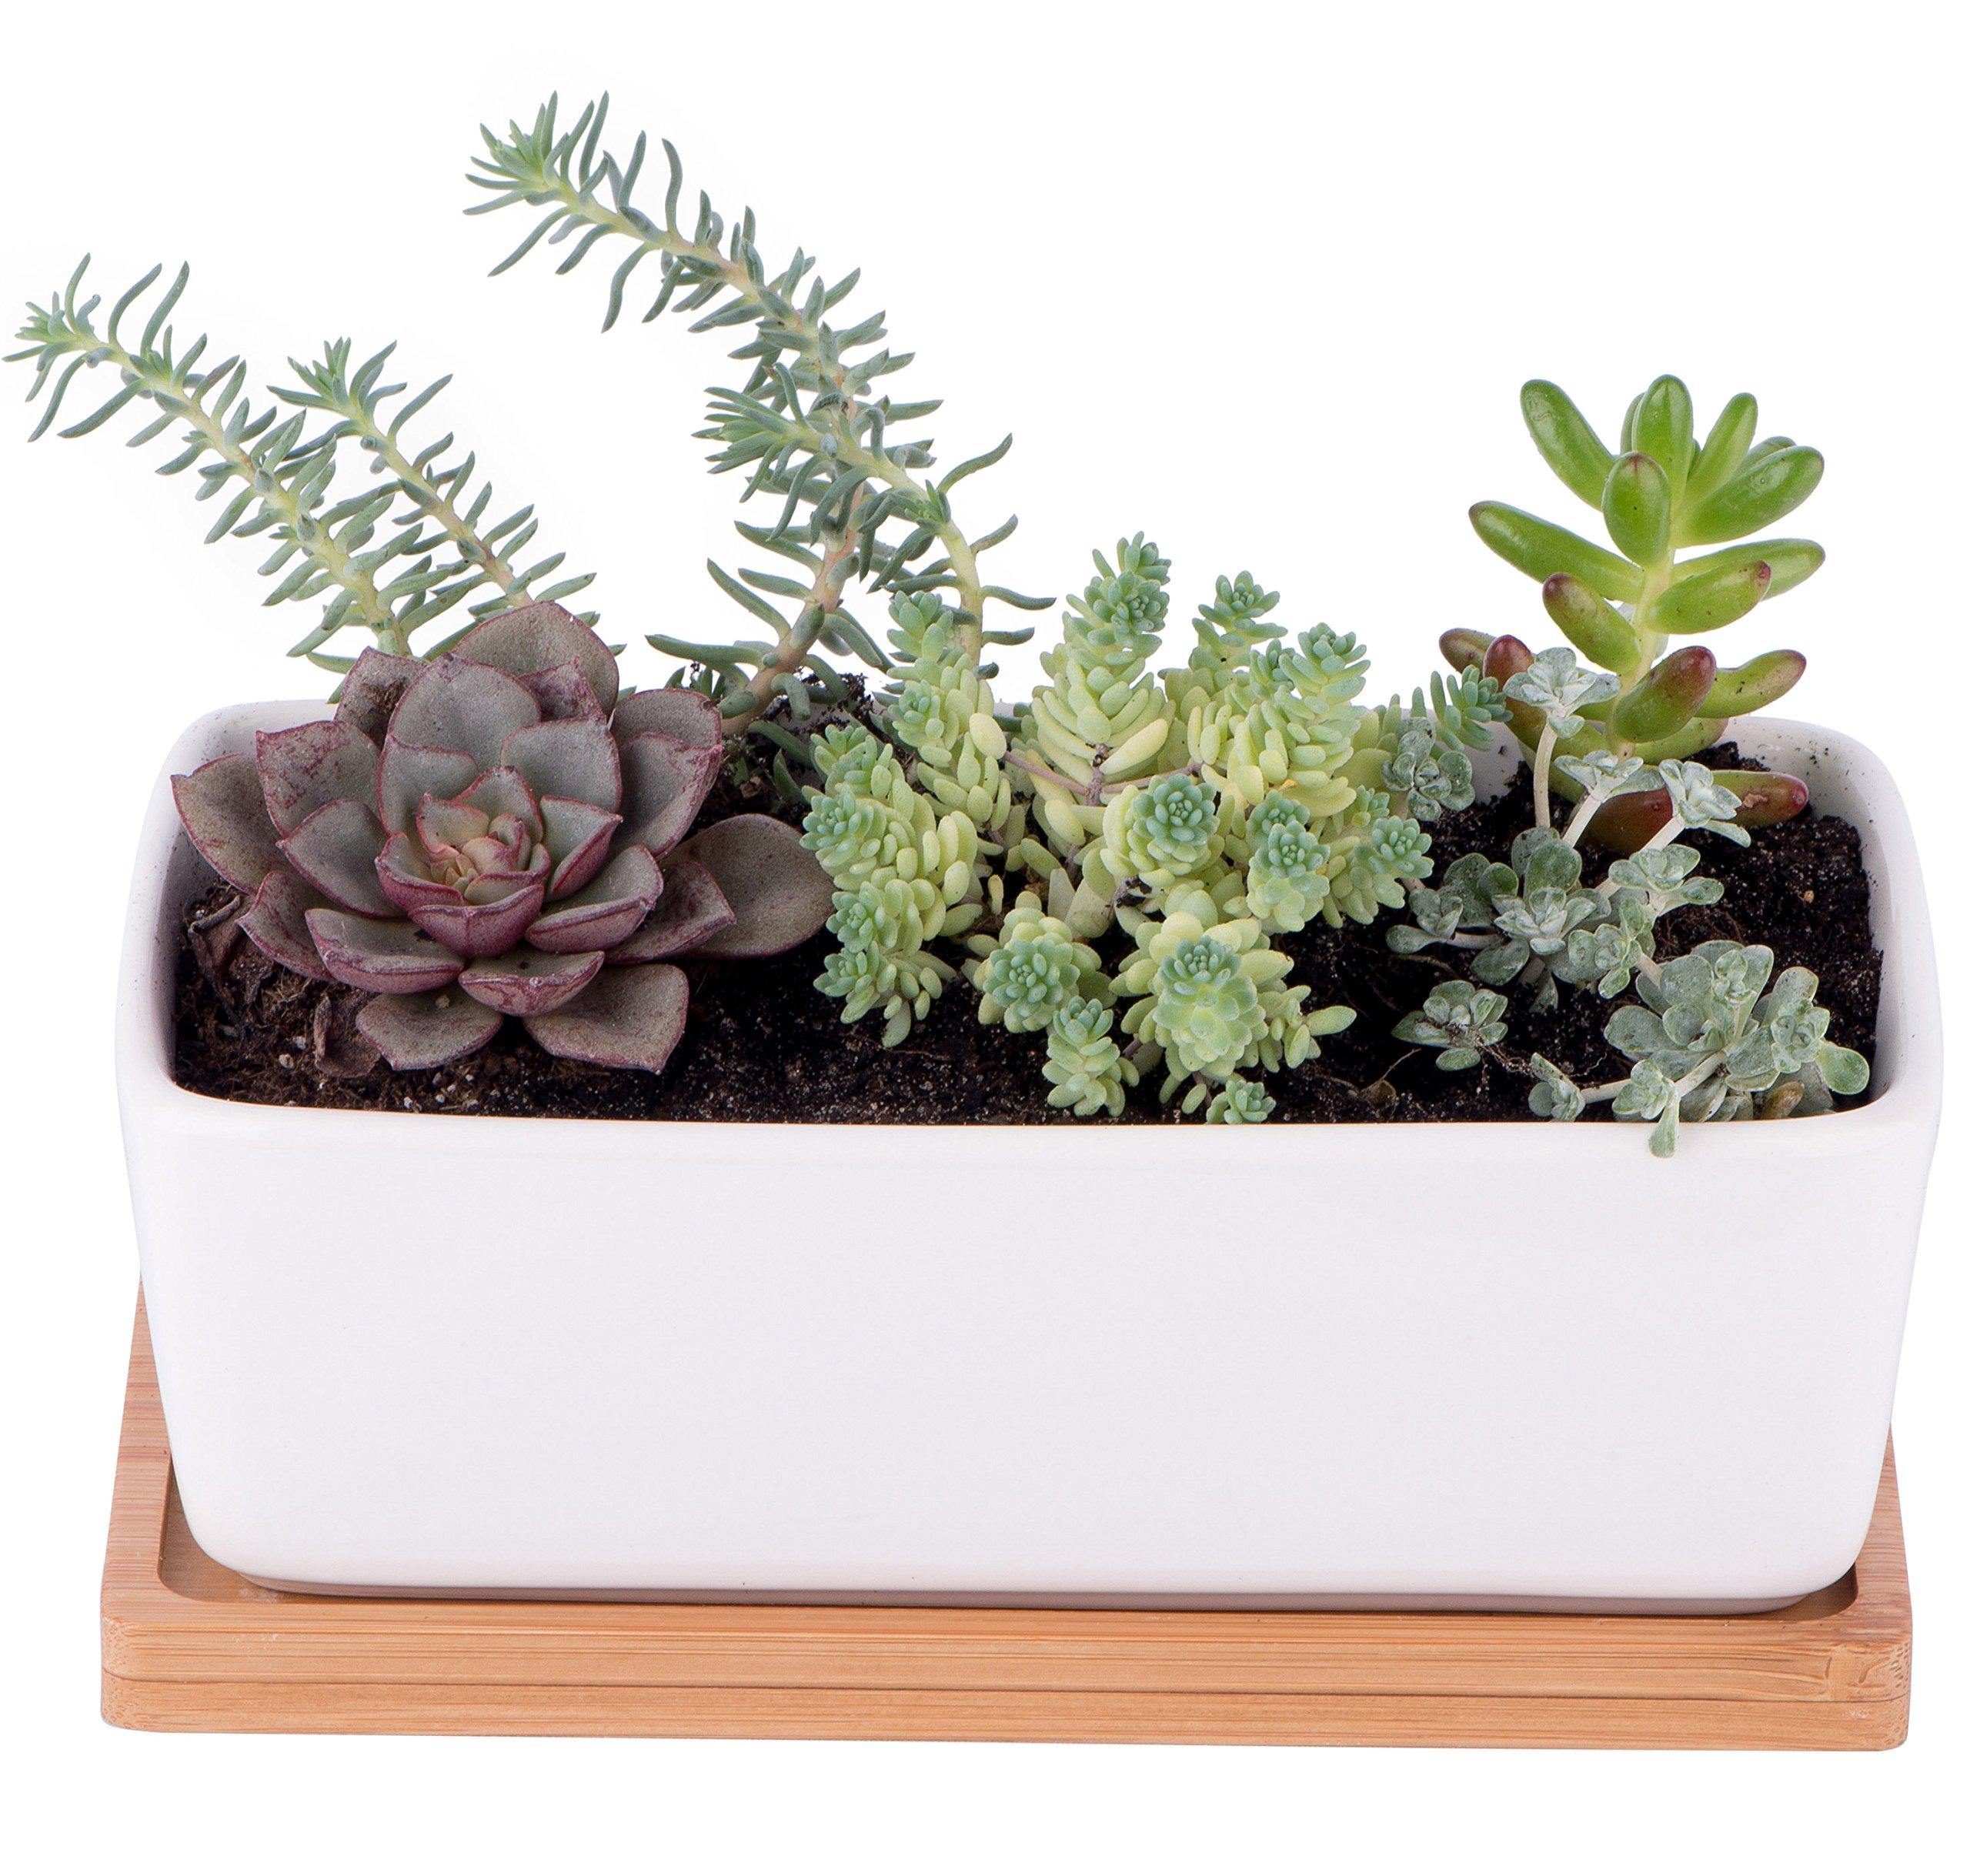 StarPack Premium Small White Ceramic Succulent Planter Pot with Bamboo Base